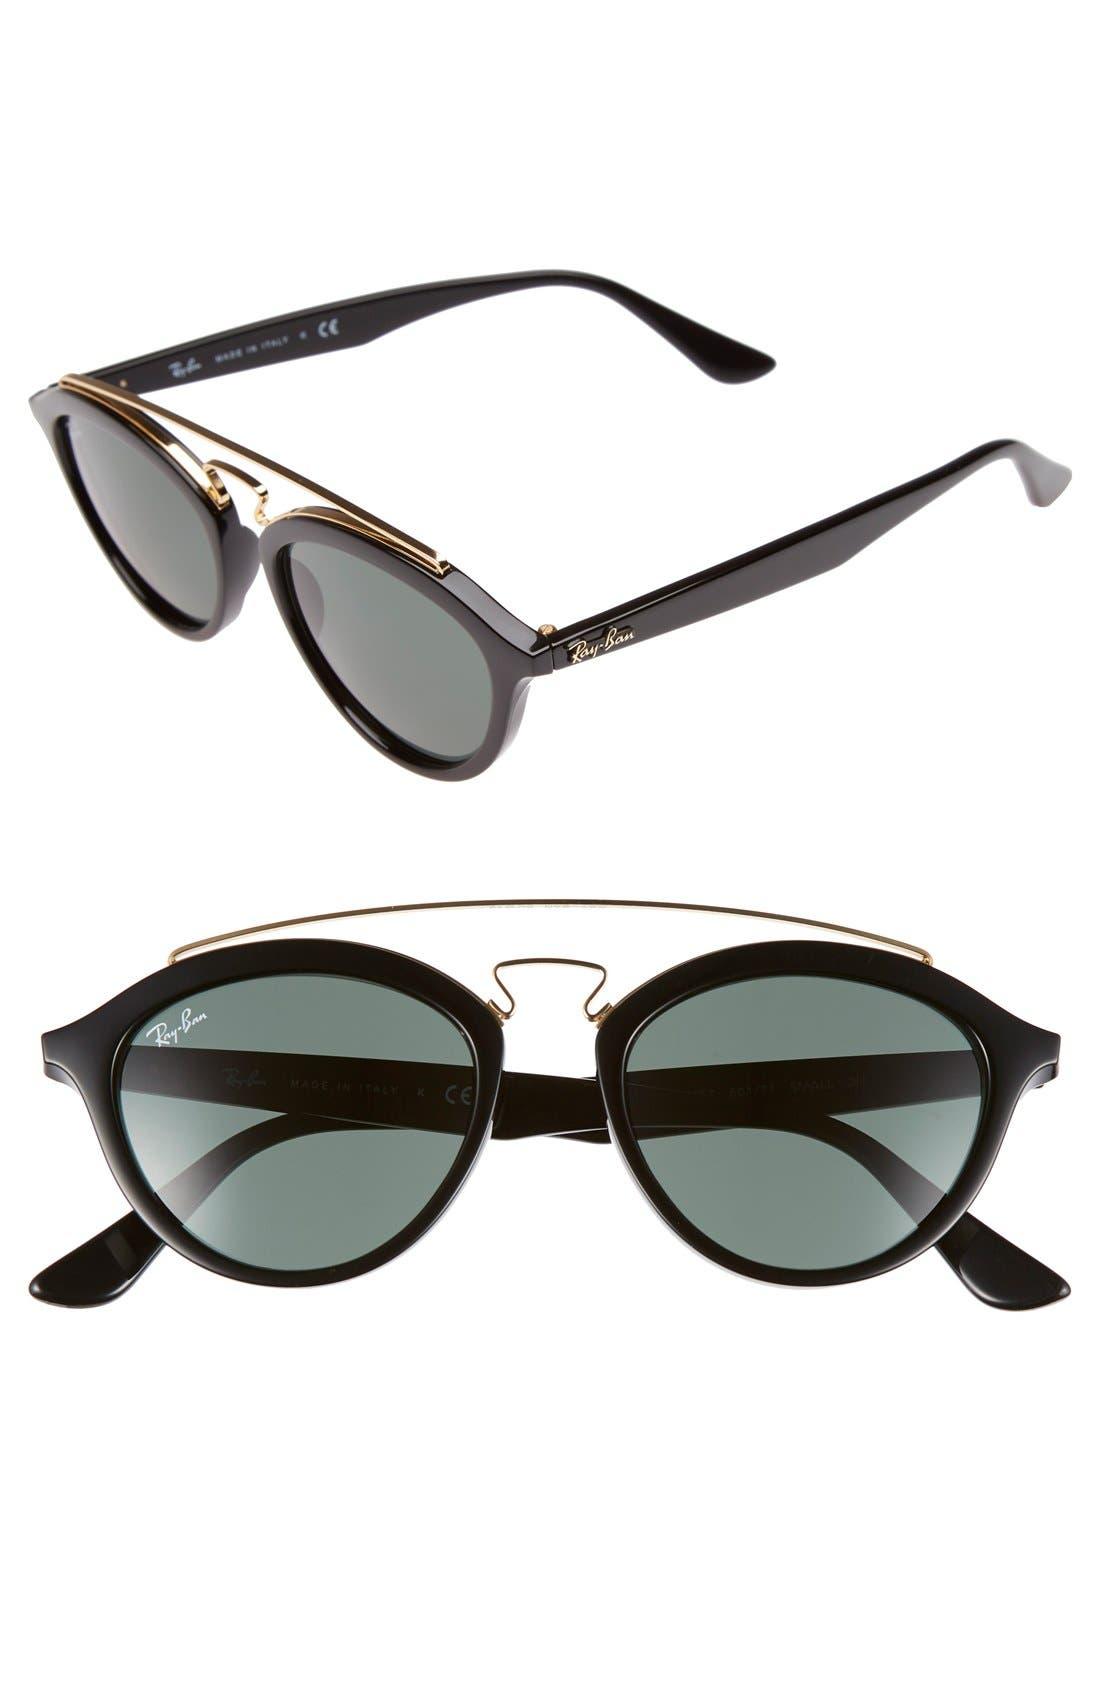 Highstreet 50mm Brow Bar Sunglasses,                             Main thumbnail 5, color,